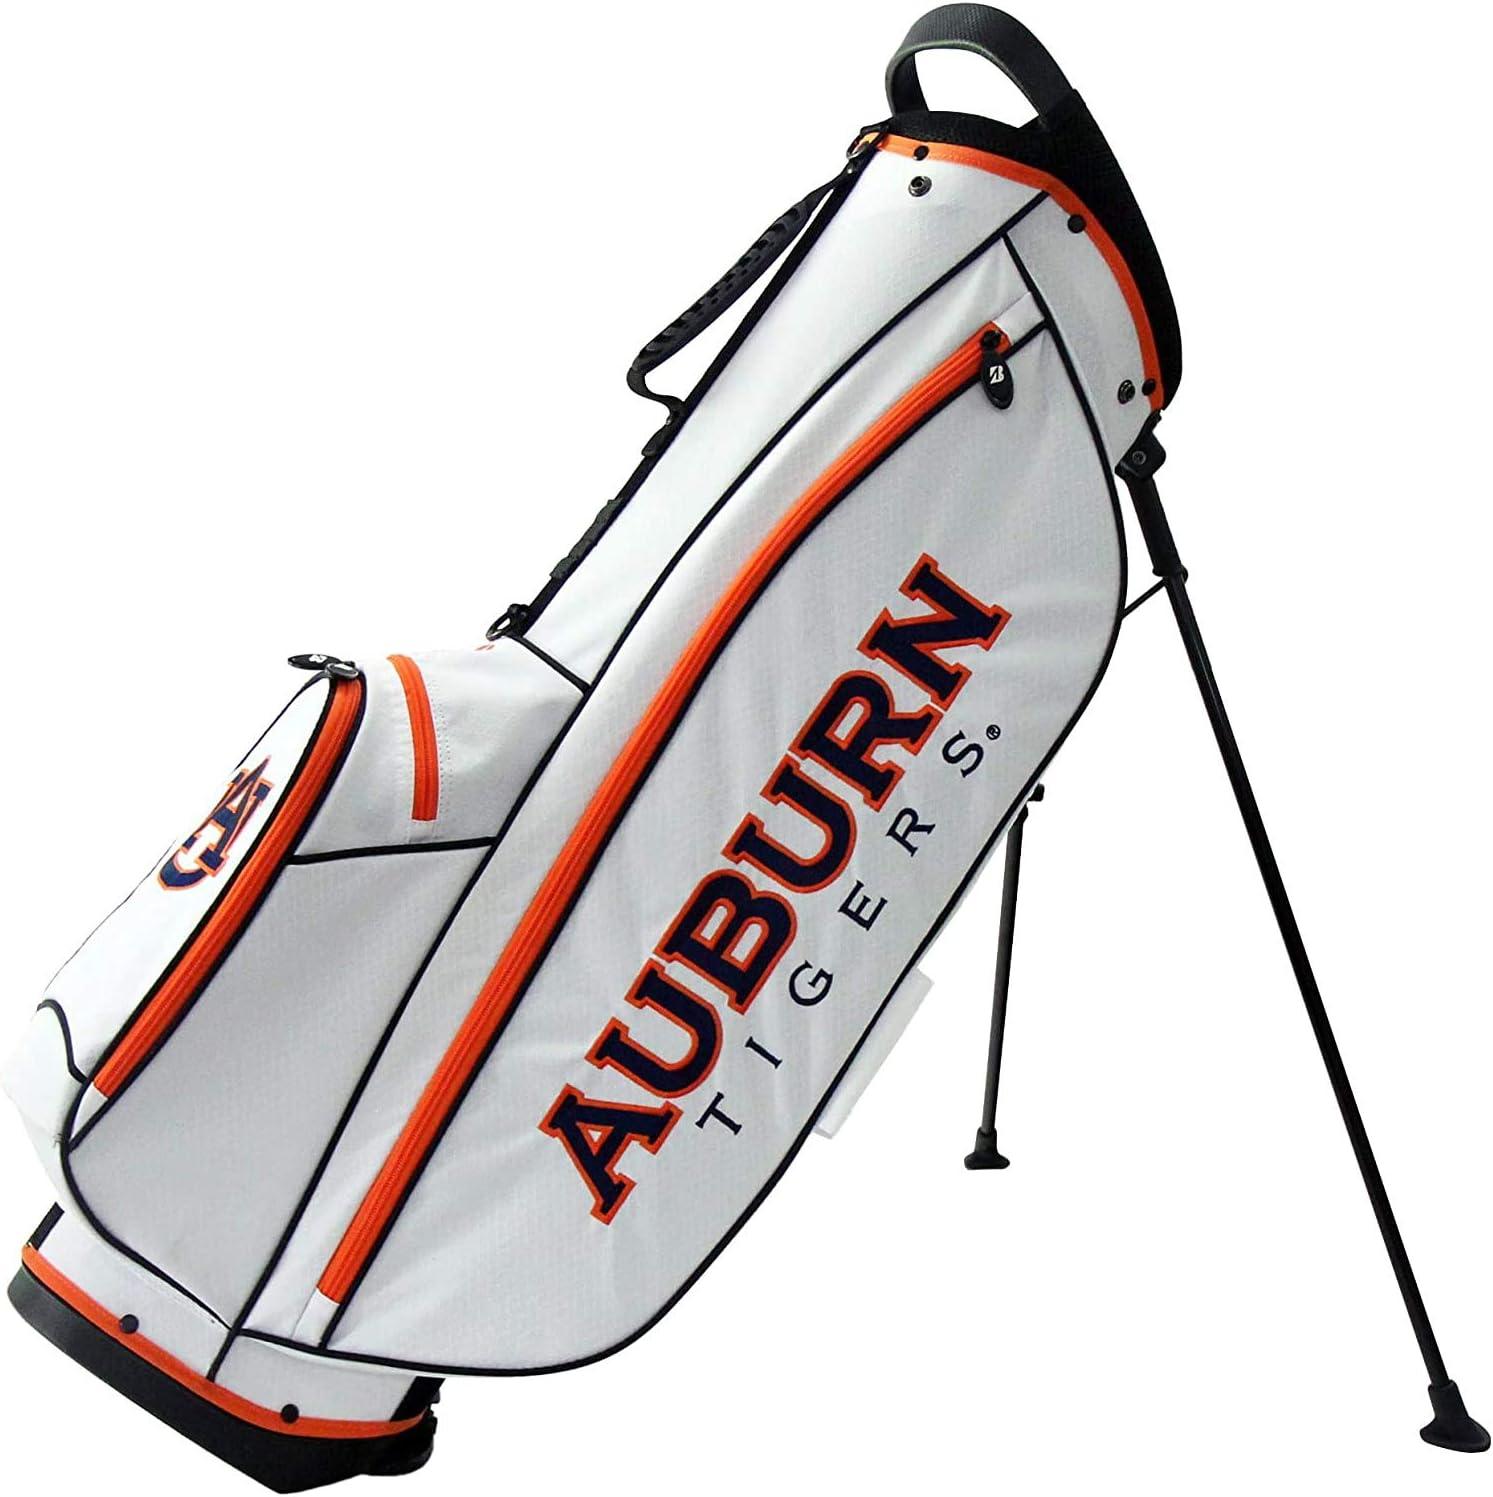 Bridgestone 2019 Collegiate University NCAA 9 In 4 Way Stand Lightweight Golf Bag with Carry Handle, Auburn